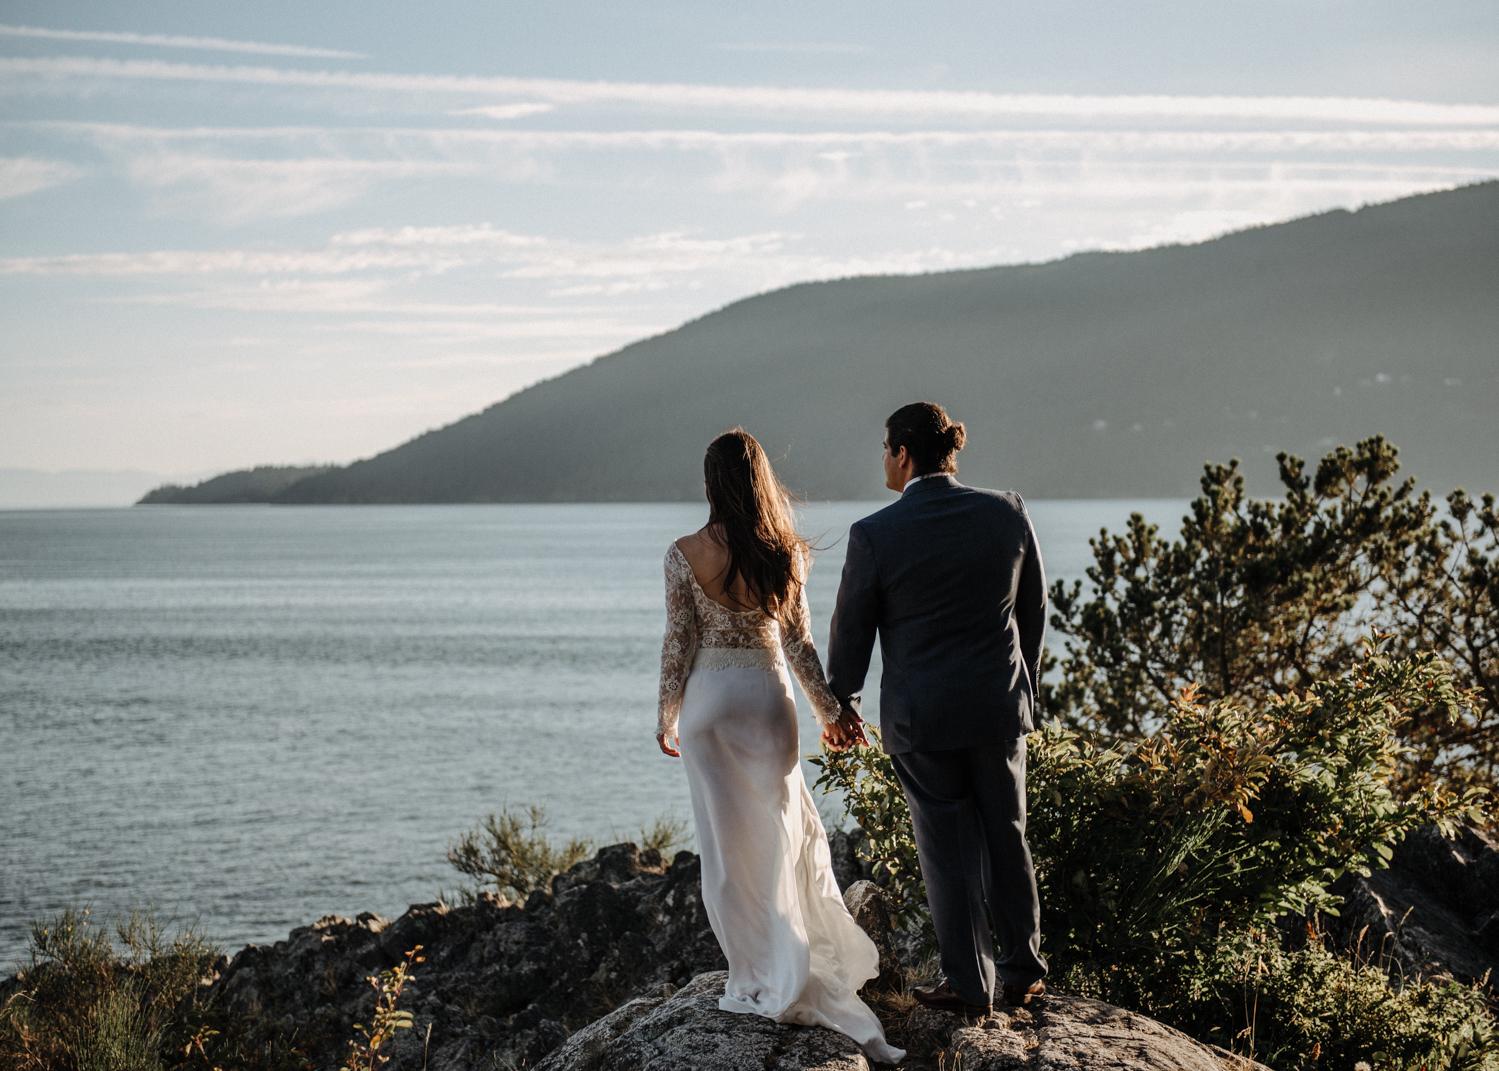 kaoverii_silva_photographer_lison_iman_wedding_websize-298.jpg